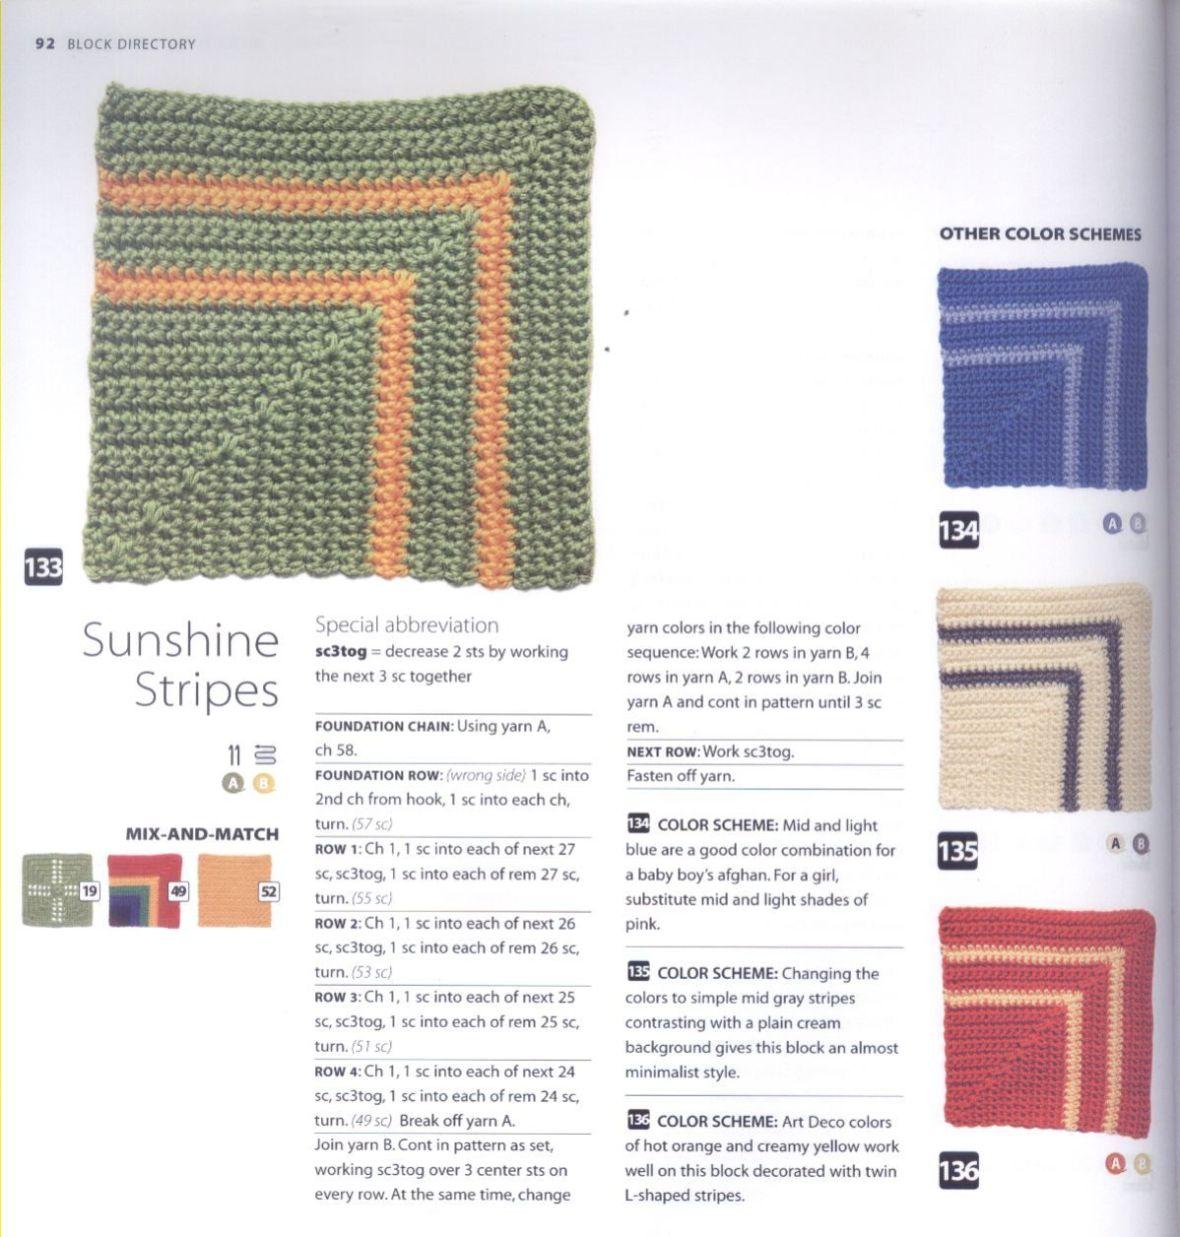 200 Crocheted Blocks for blankets, throws & Afghans 092